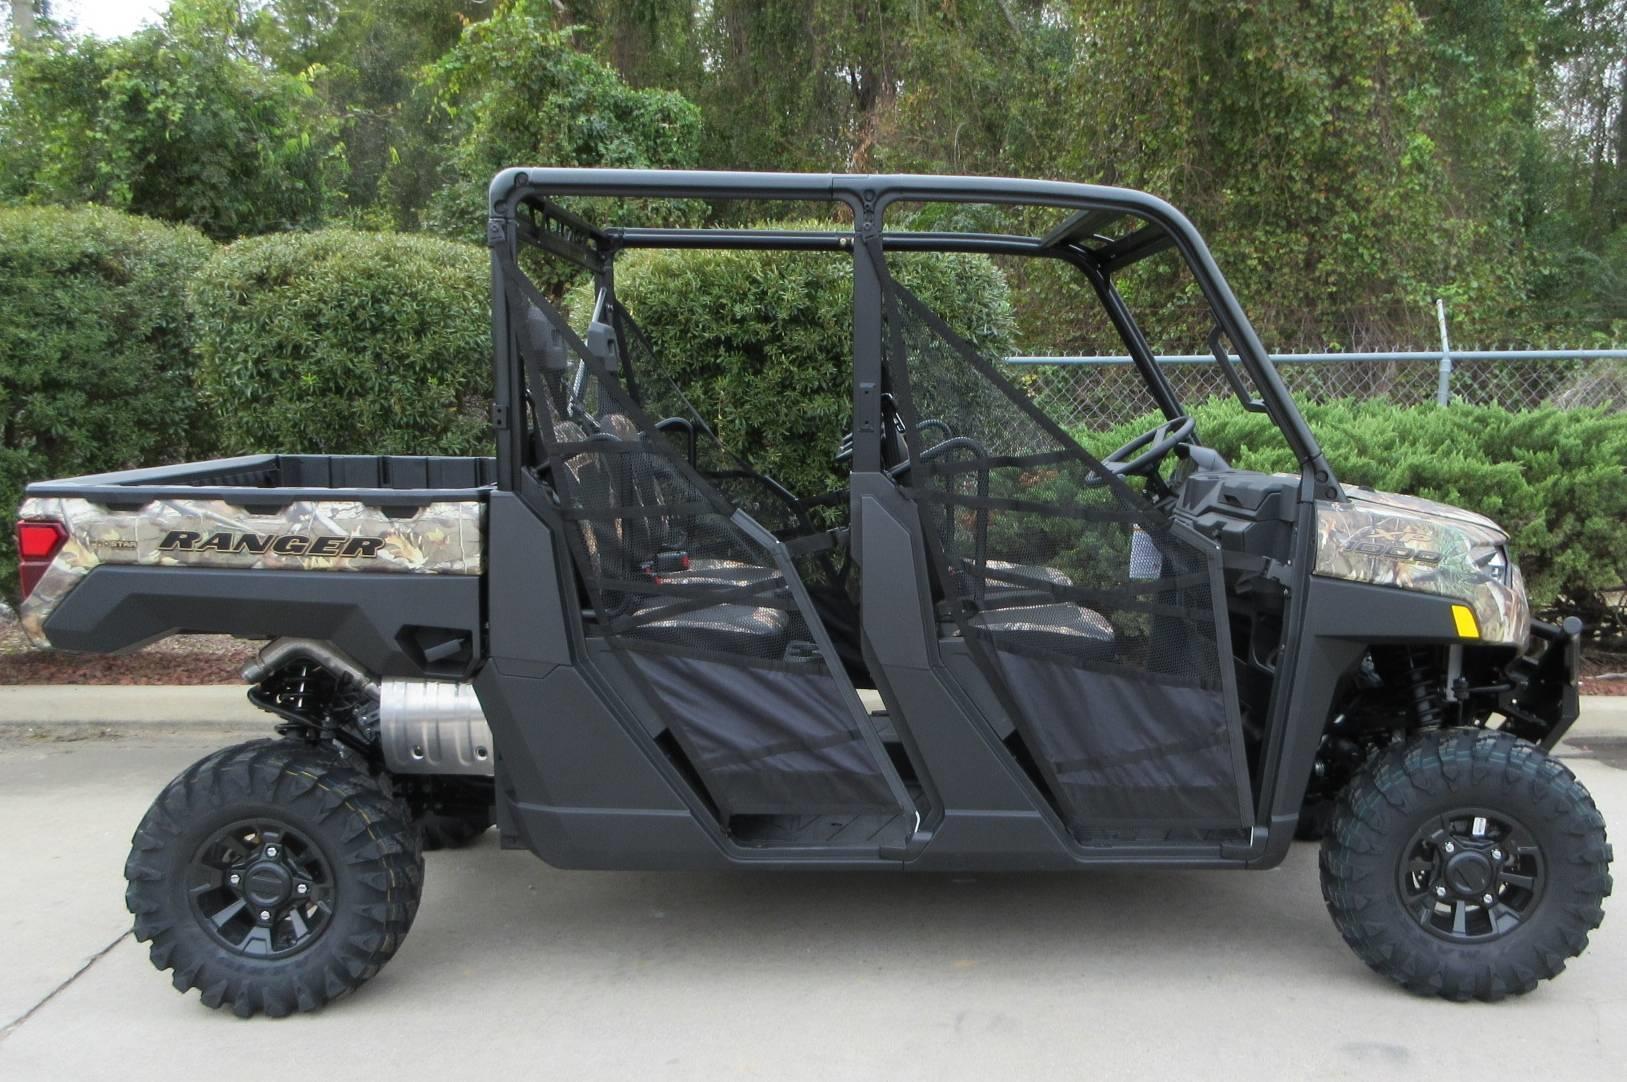 Factory Cheap Price Ranger Crew XP 1000 EPS Premium UTV 1